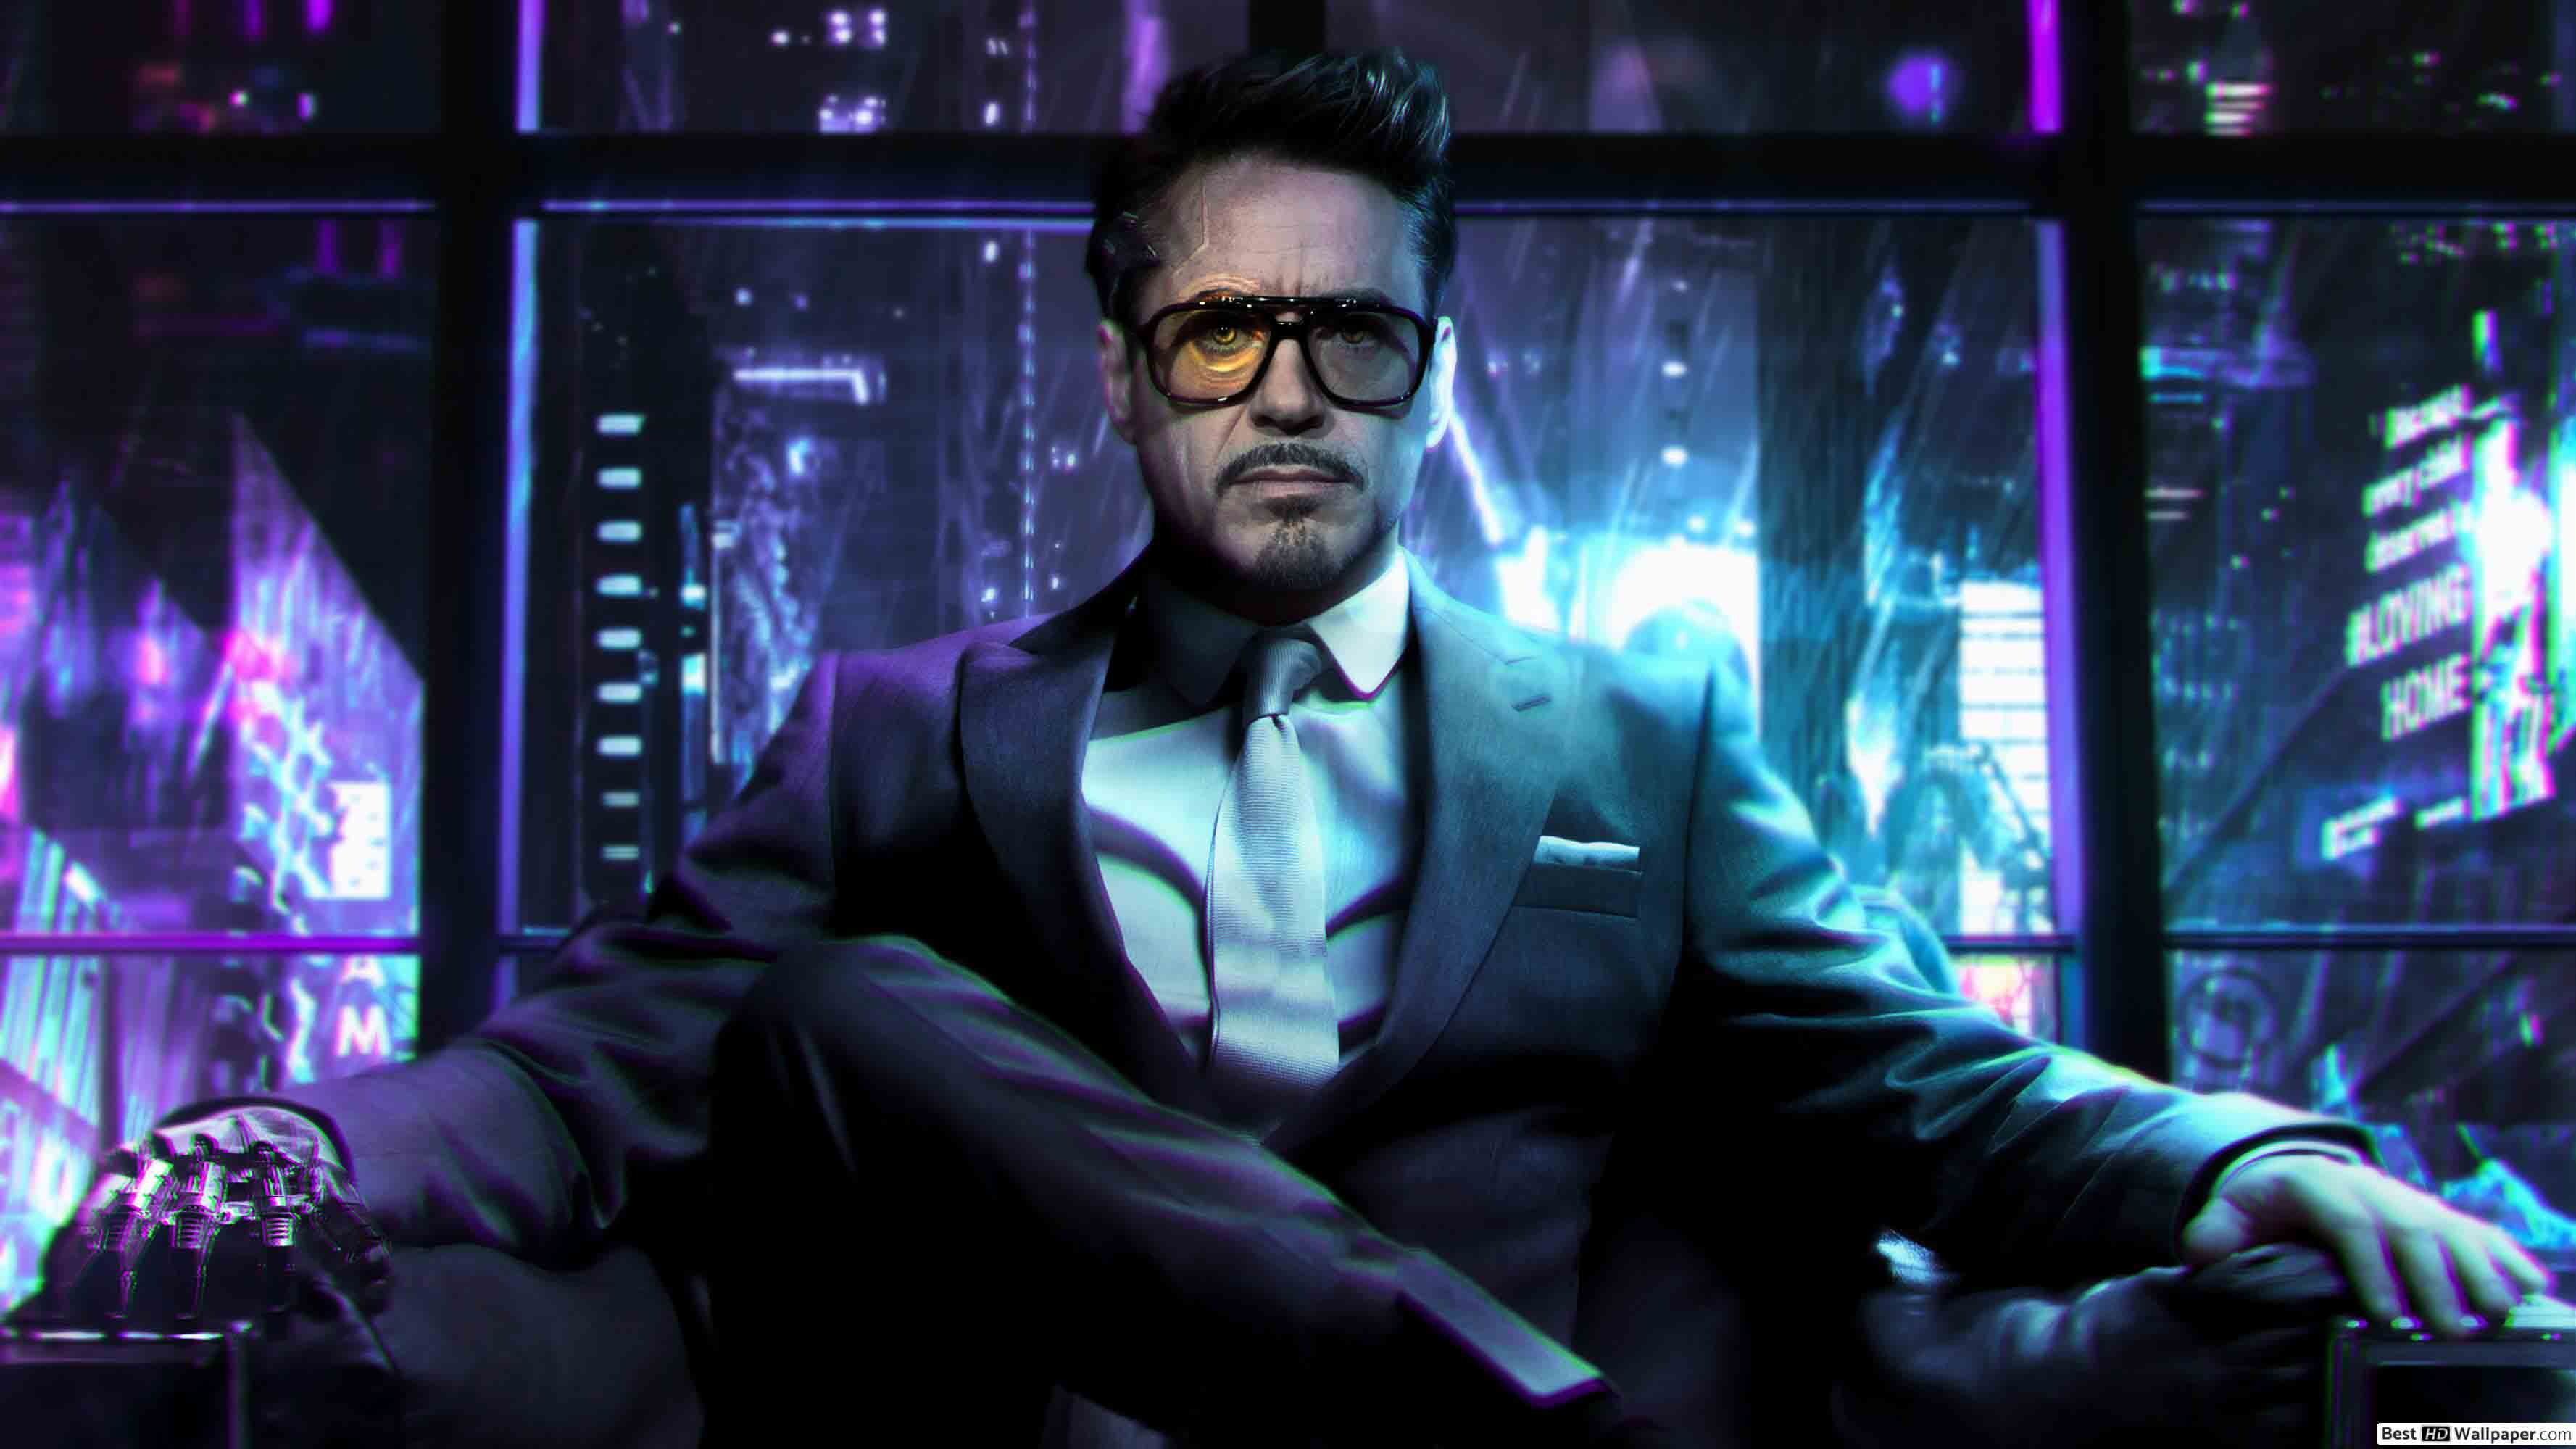 Robert Downey Jr declive y ascenso de un superhéroe